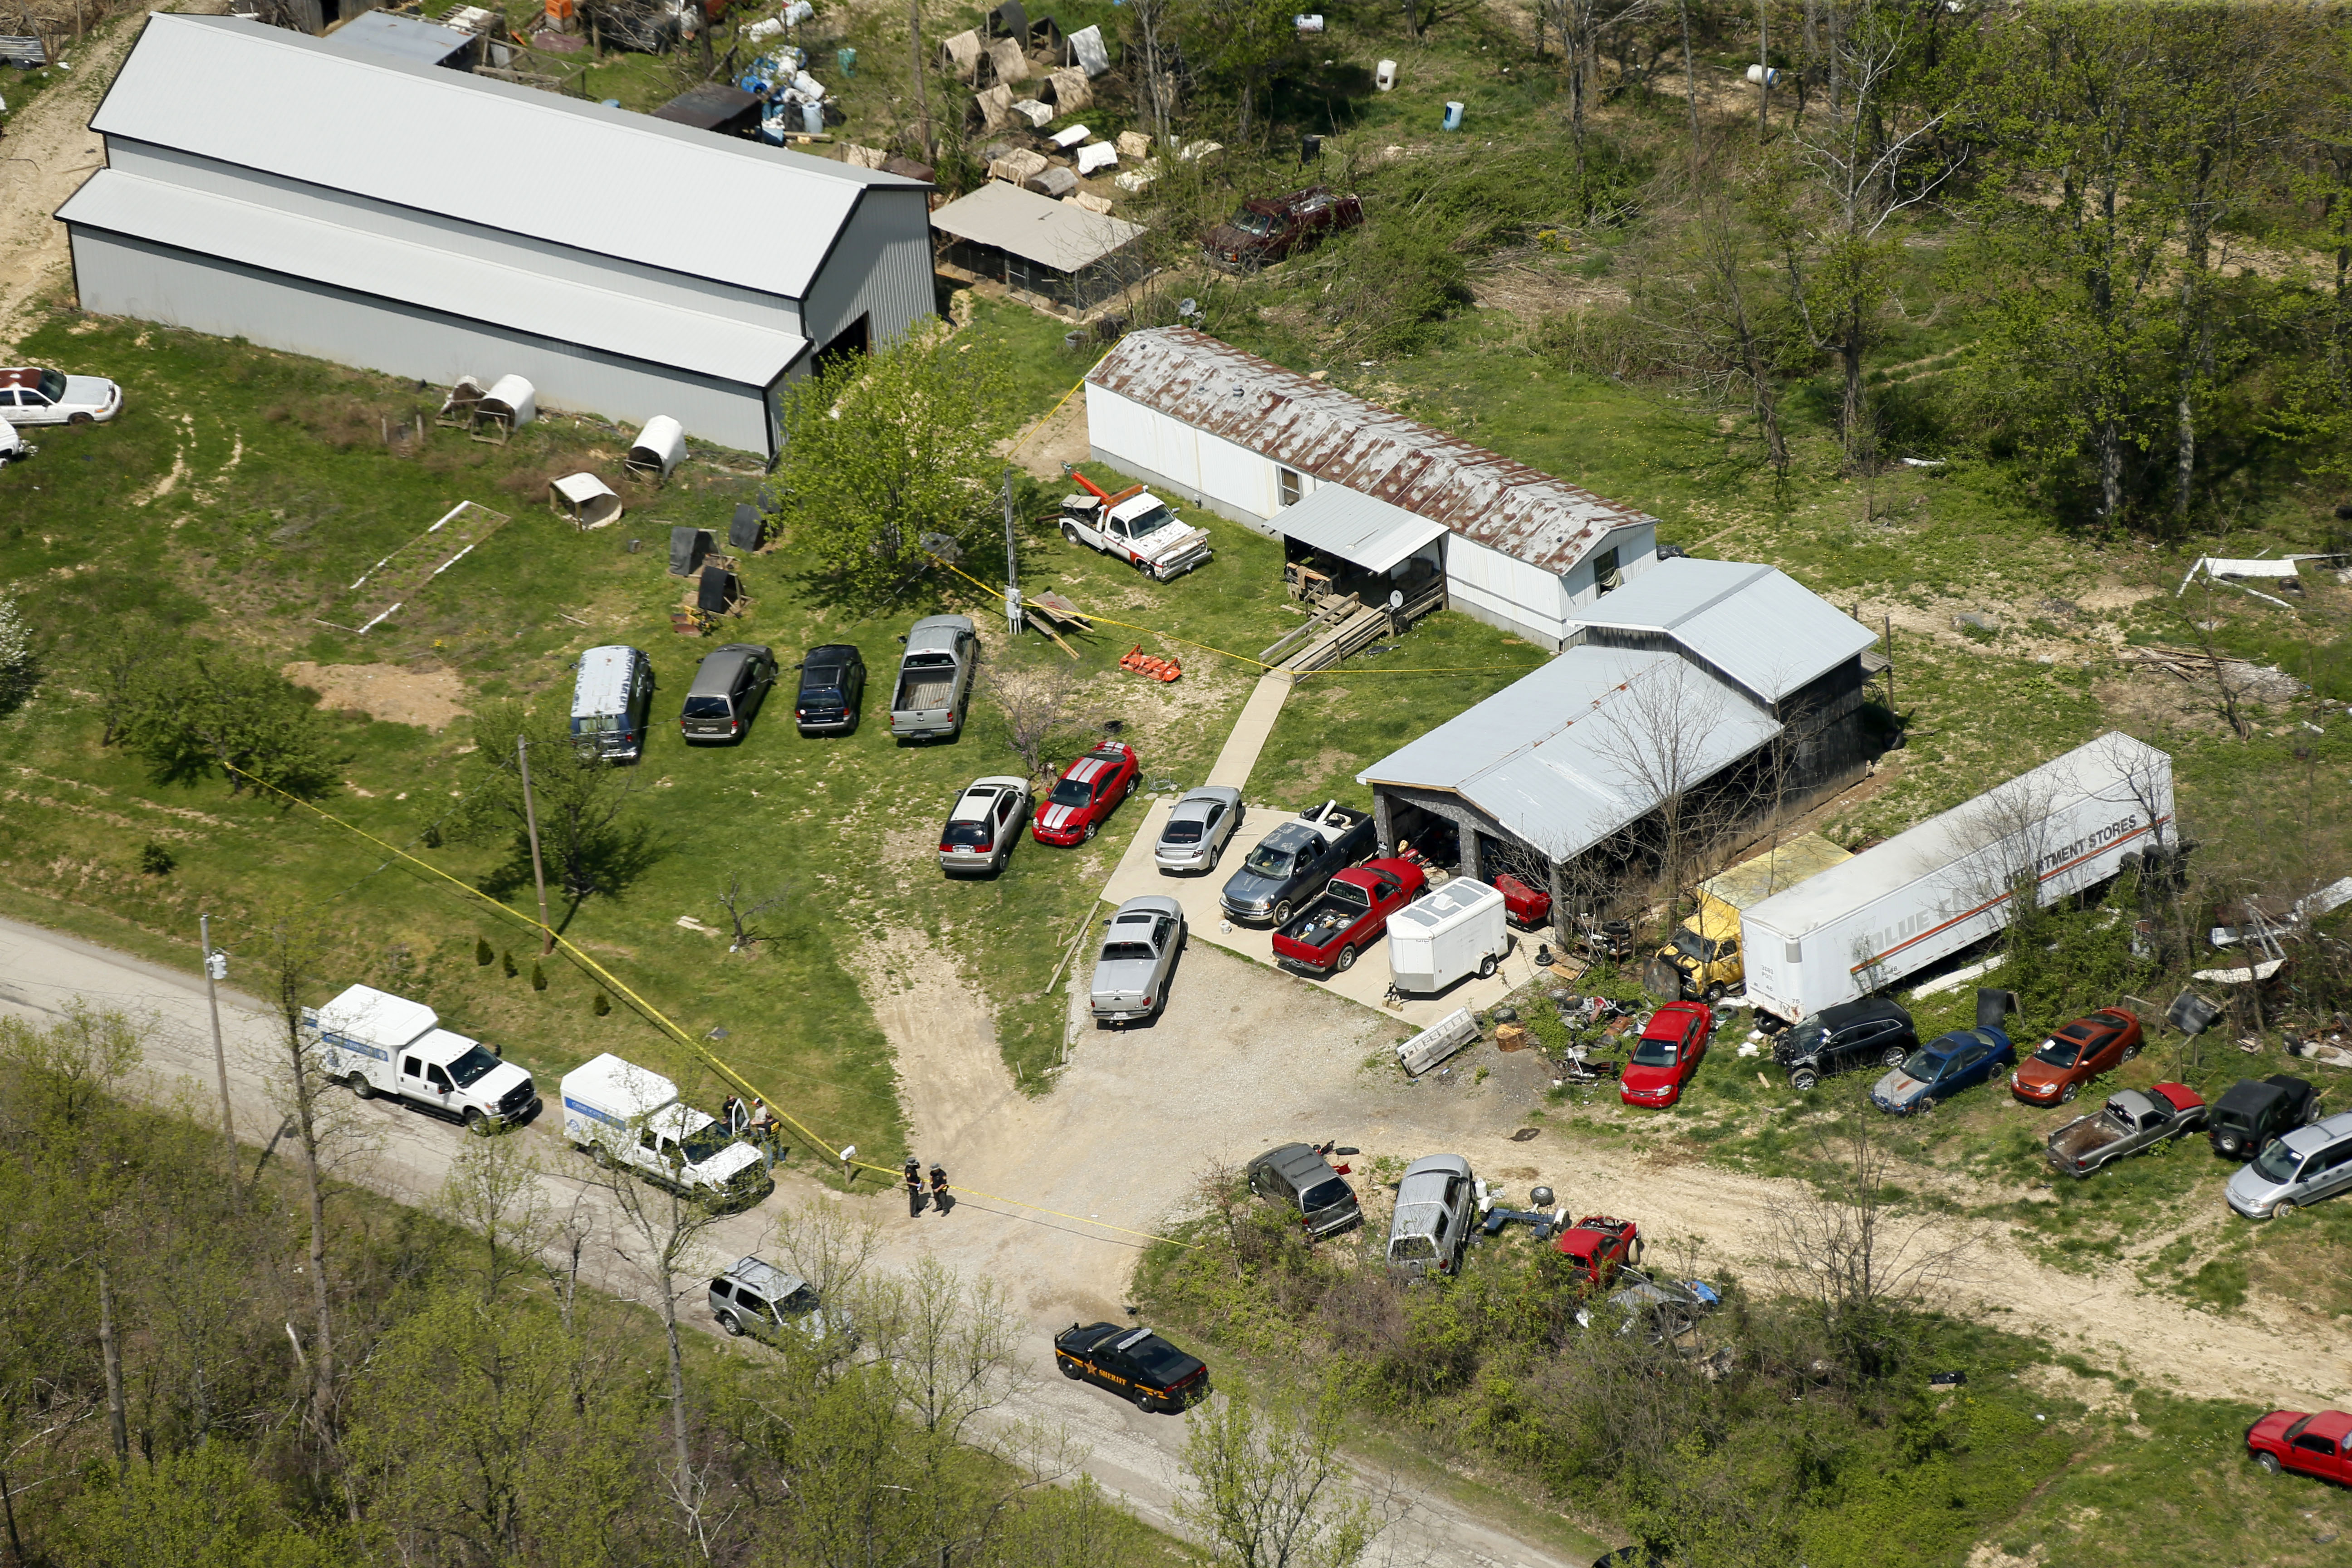 Victim in Ohio Family Massacre Had Dollar Bills Thrown on His Body, Report Says